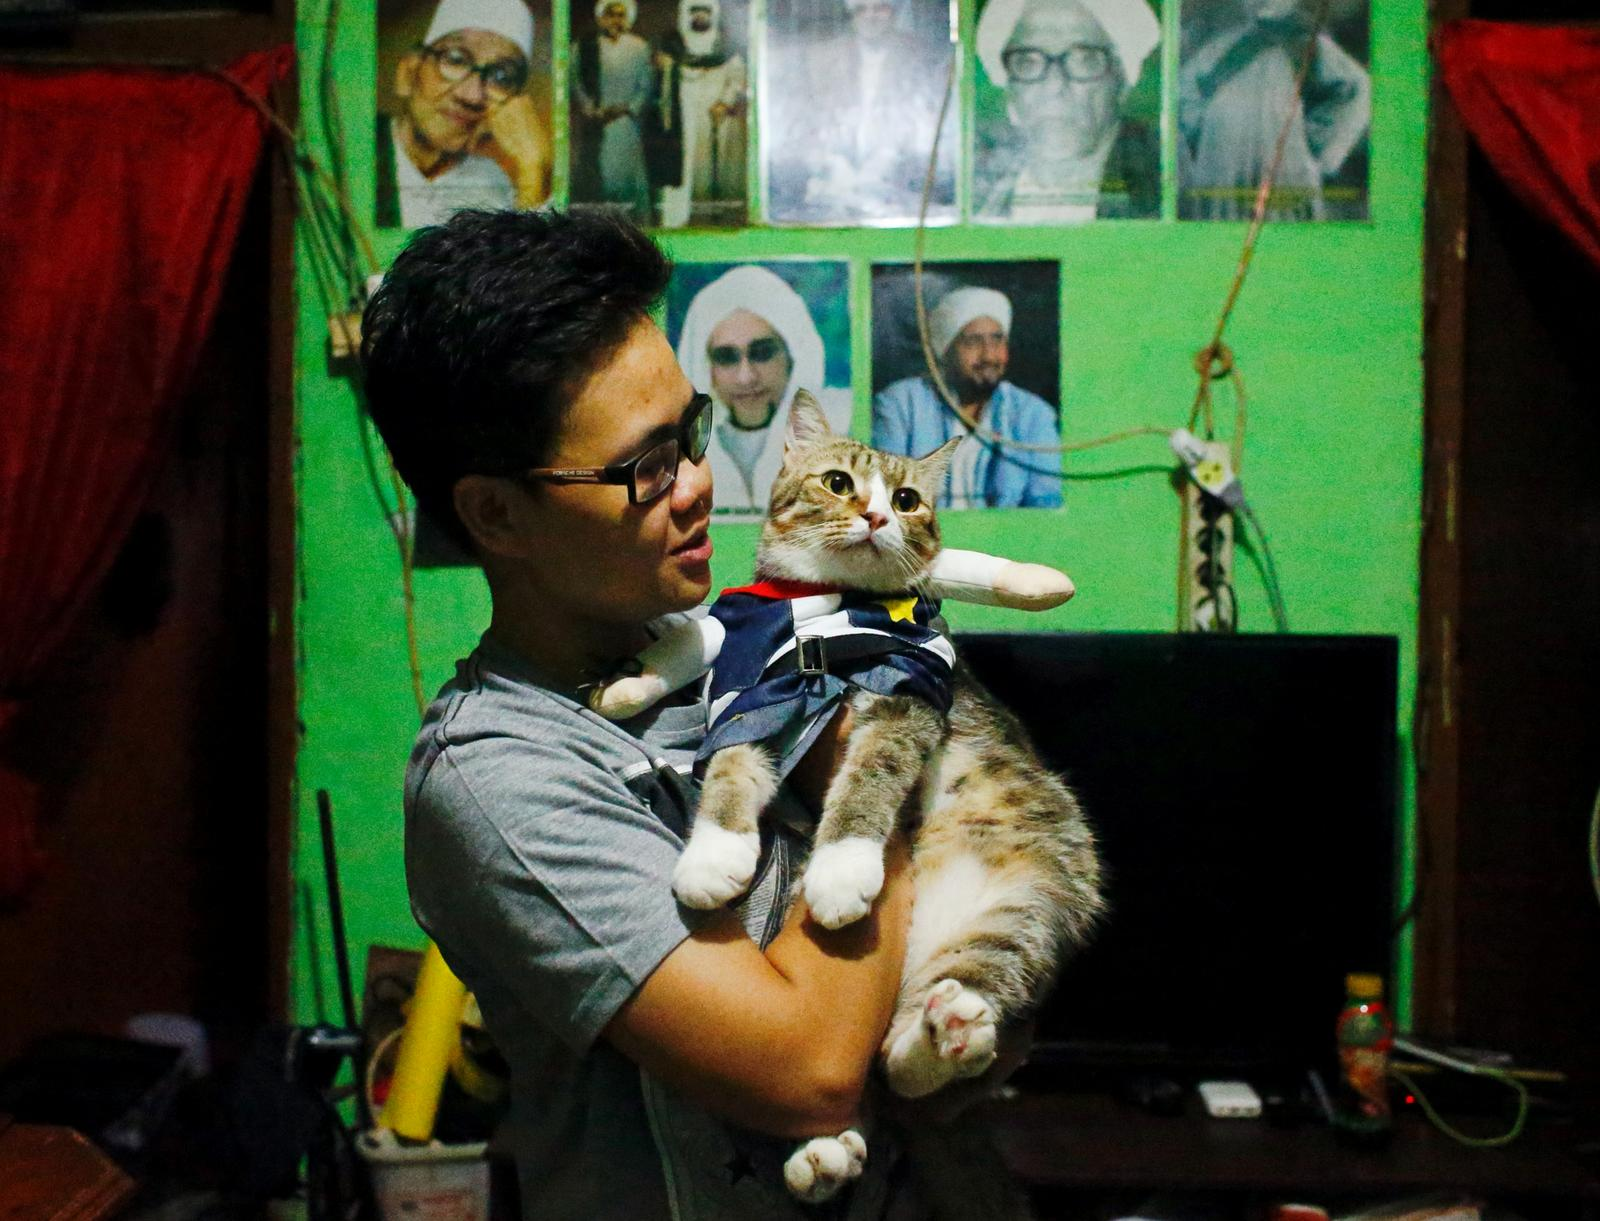 isma Sandra Irawan, 31, carries her cat wearing a cosplay costume, in Jakarta, Indonesia, November 29, 2020. Photo: Reuters